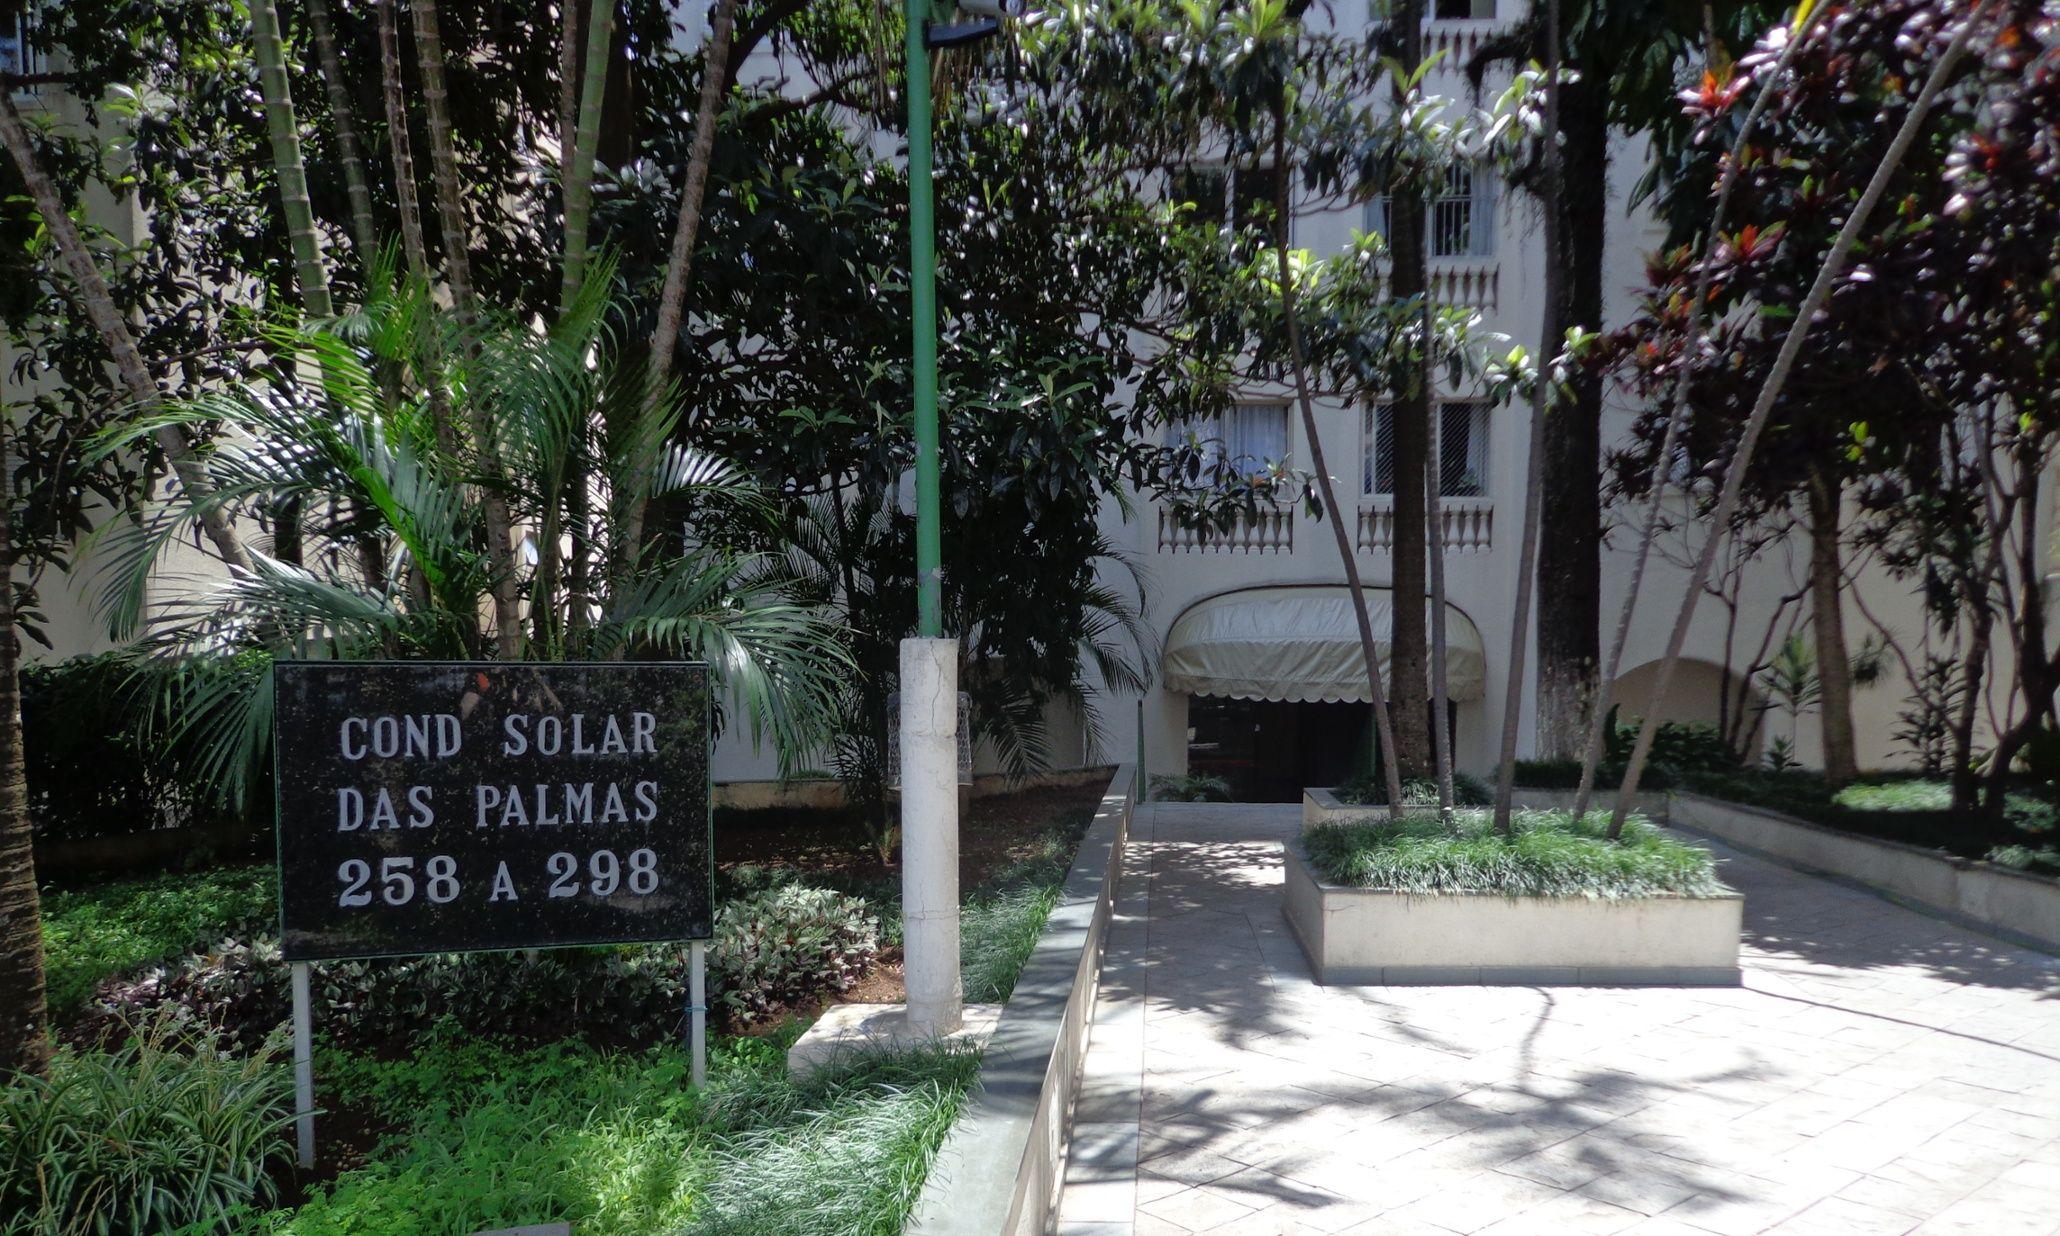 São Paulo – anatomy of a failing megacity: residents struggle as ...